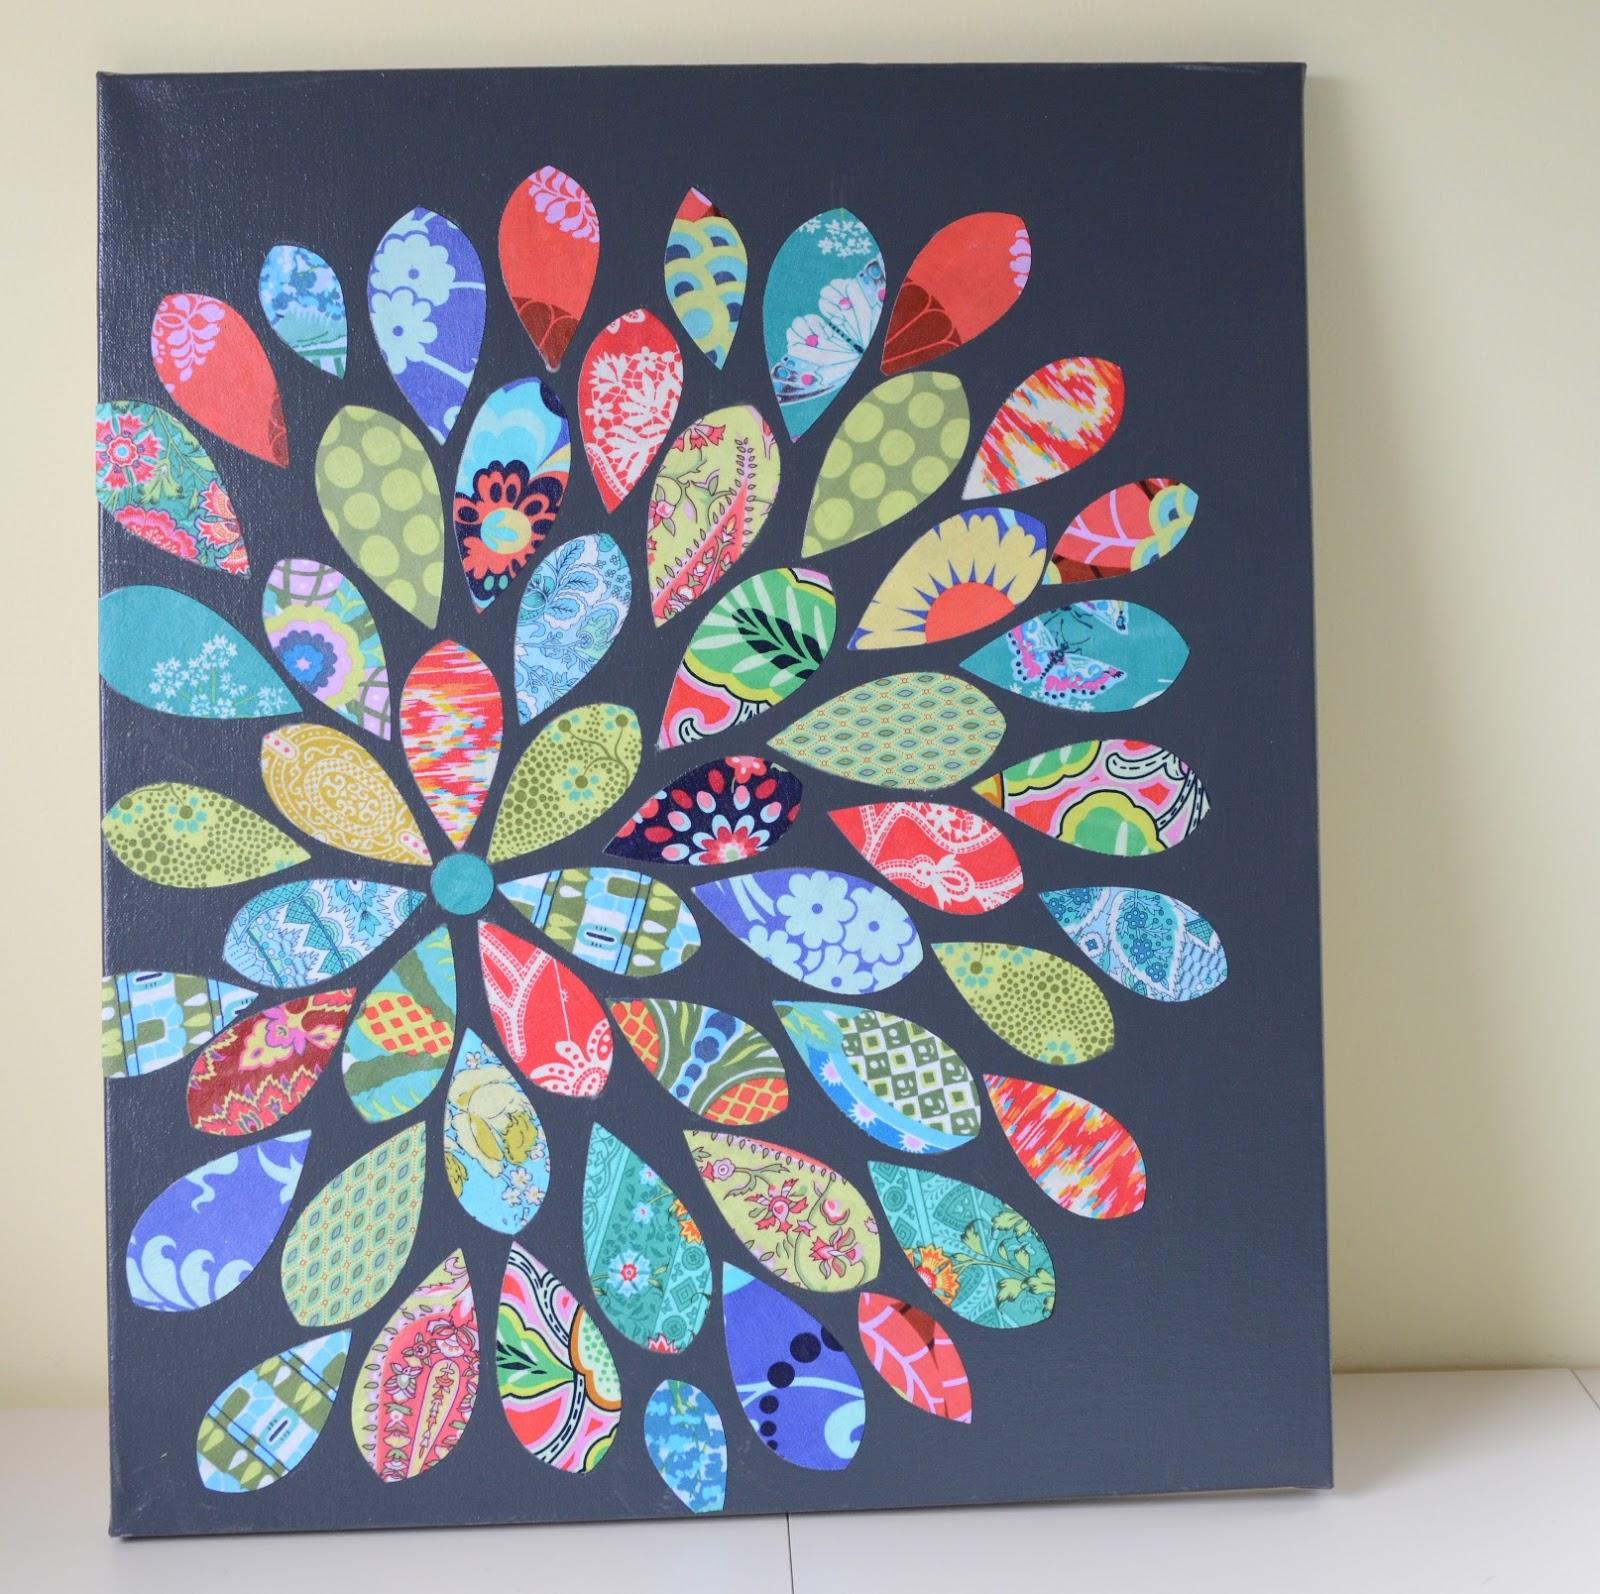 Hyacinth Quilt Designs: My big mistake!